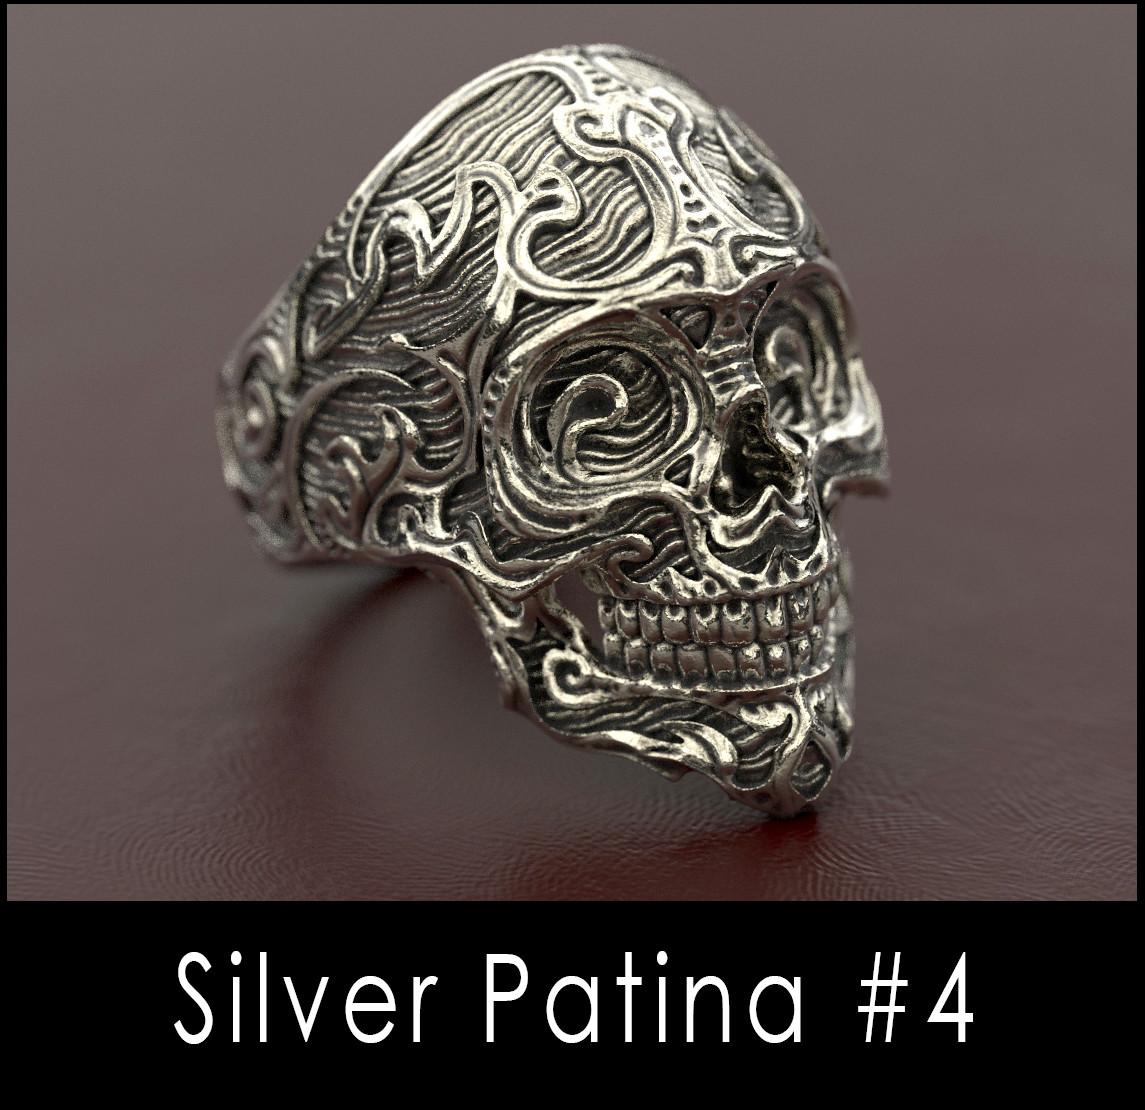 Nacho riesco gostanza silver patina n4